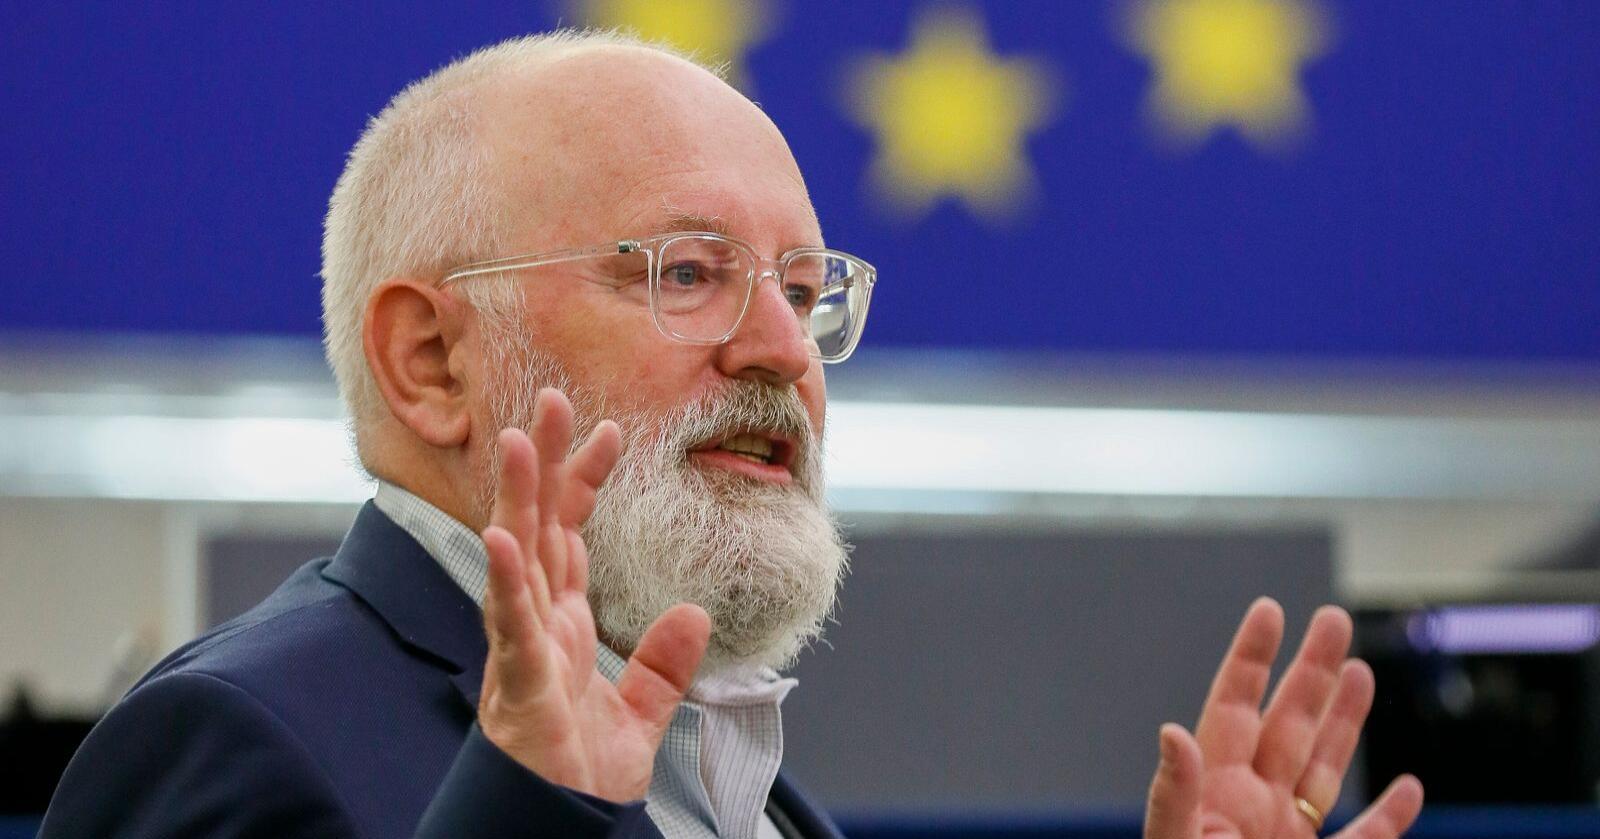 EUs klimasjef Frans Timmermans mener at EU bør sikre at de mest sårbare menneskene ikke betaler den tyngste prisen for det grønne skiftet. Foto: AP / NTB